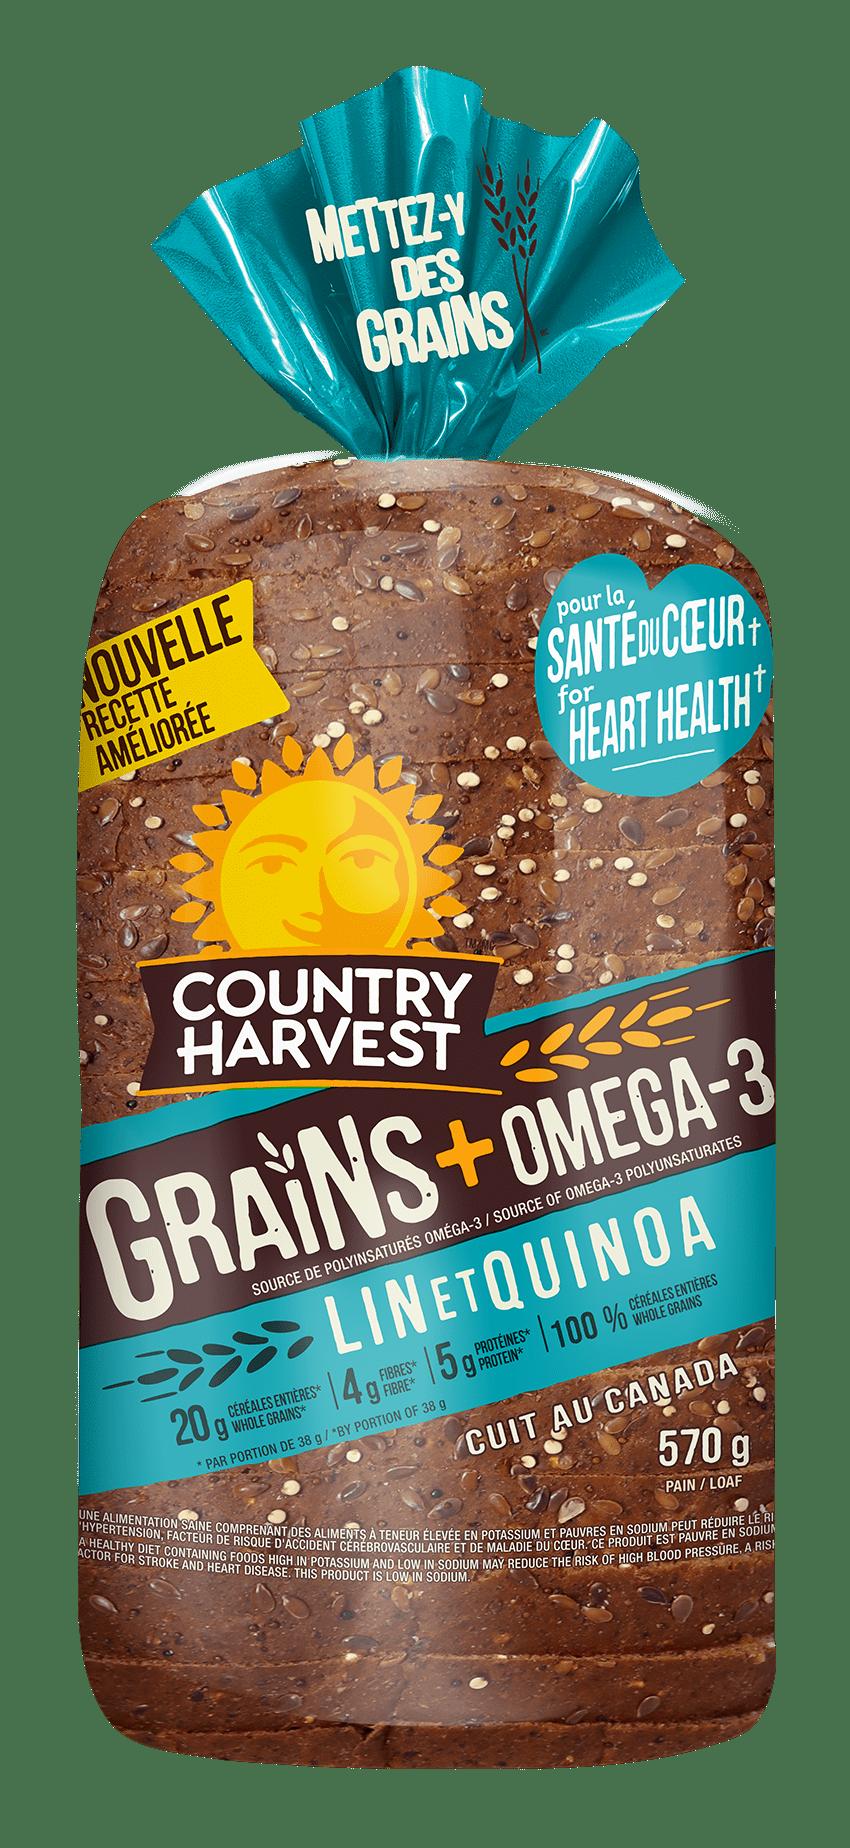 Country Harvest Lin et Quinoa